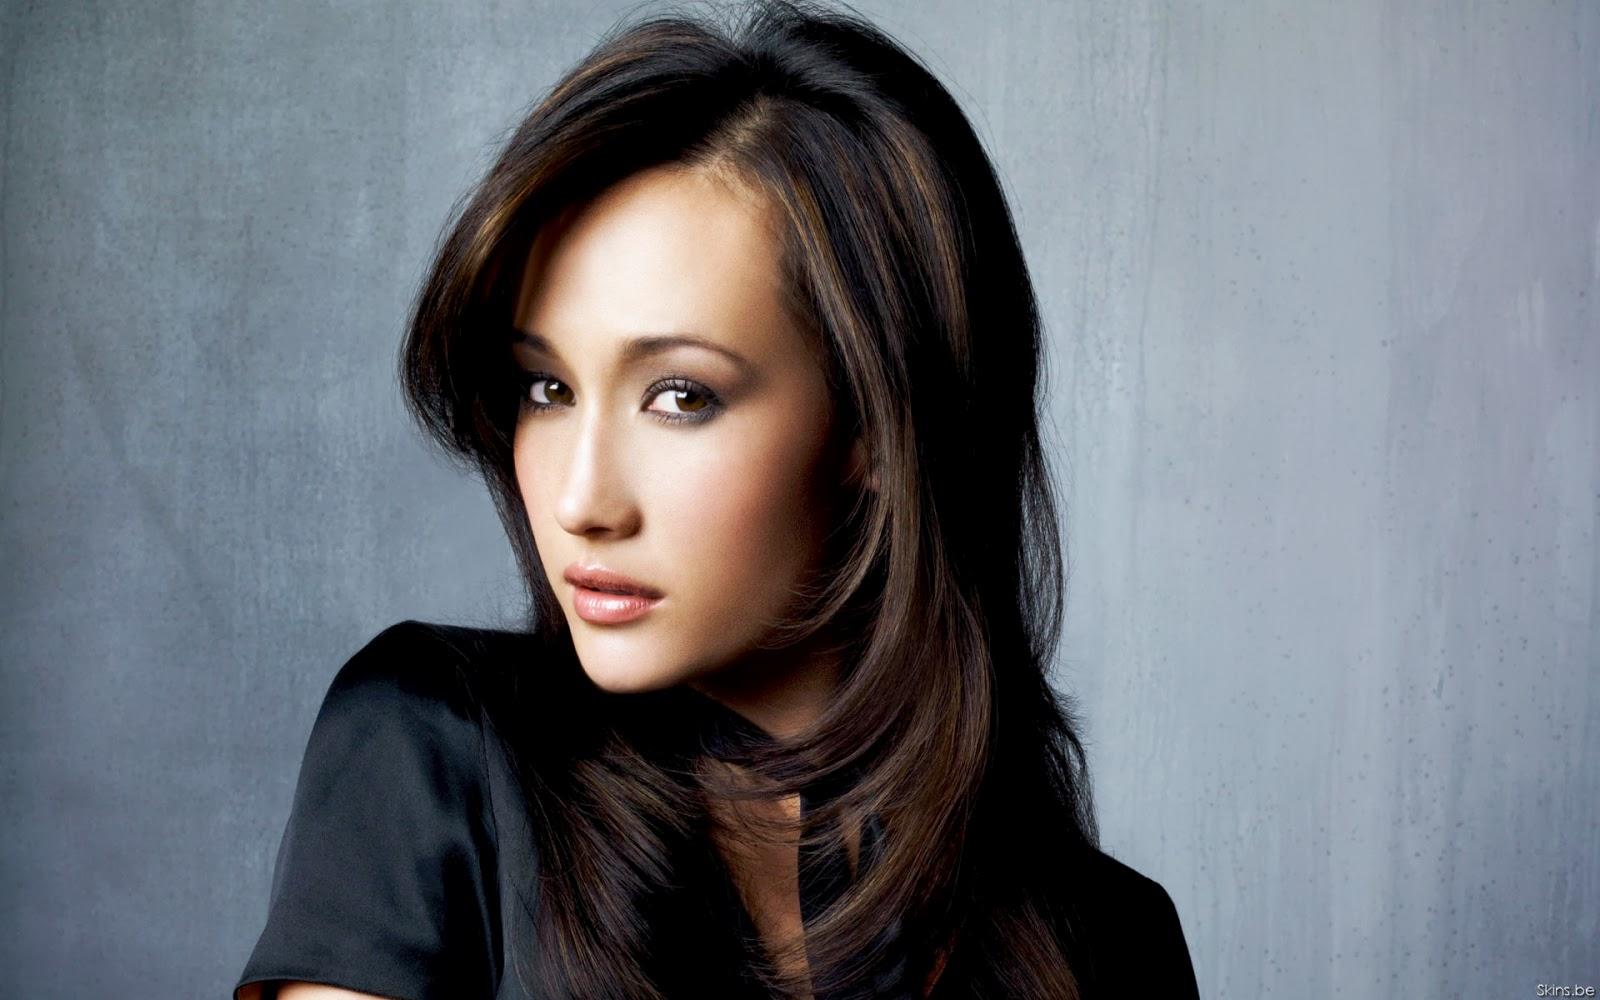 actress model beautiful - photo #48